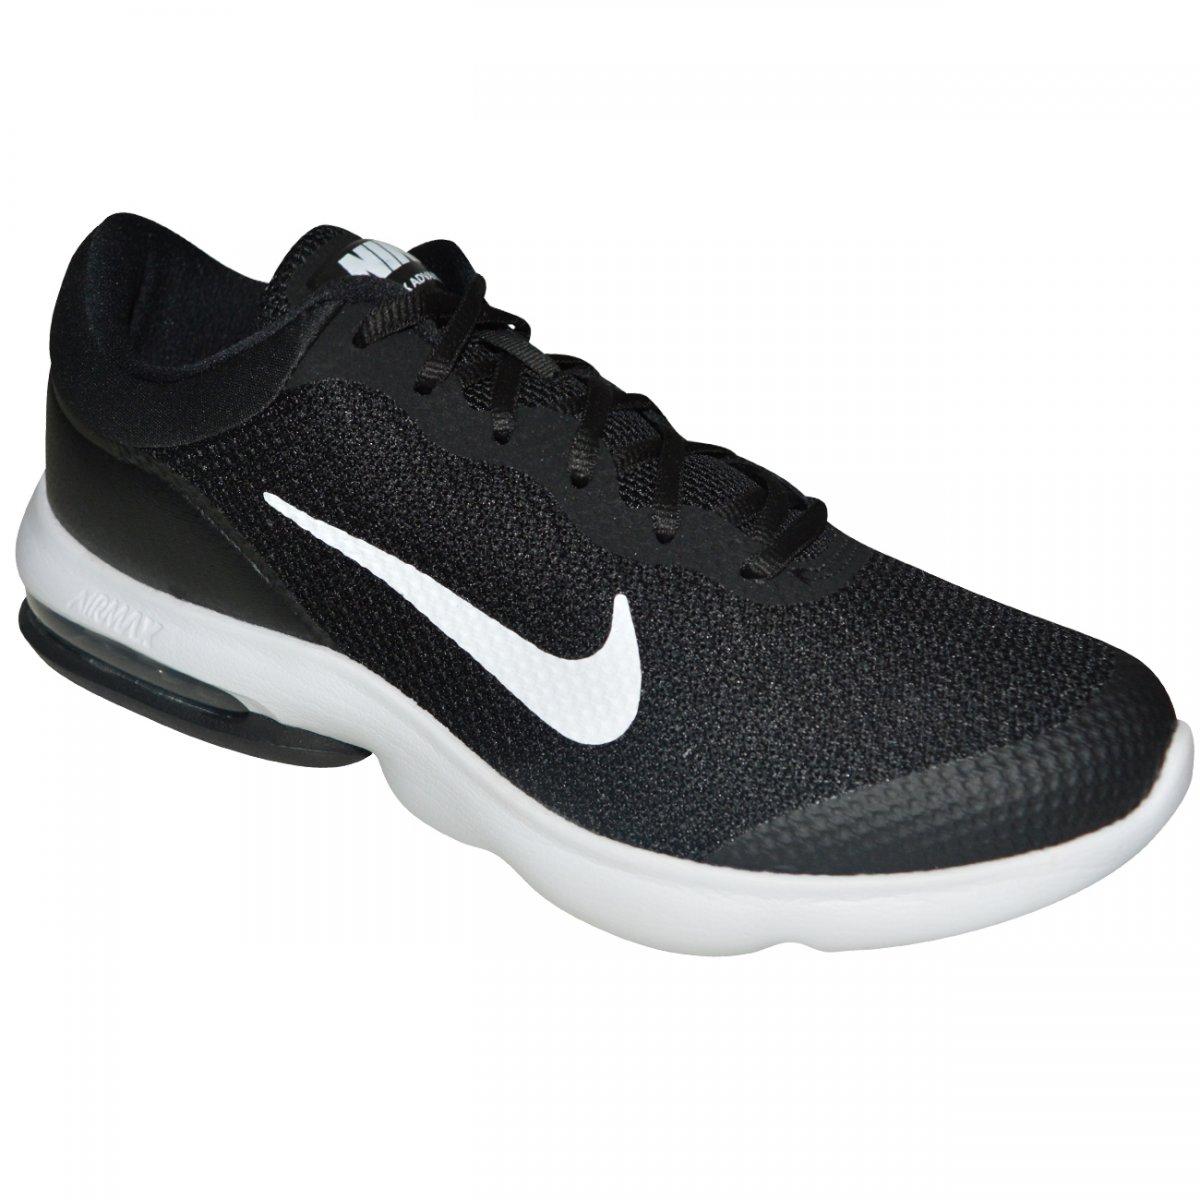 09fd74fa04 Tenis Nike Air Max Advantage 908981 001 - Preto branco - Chuteira Nike